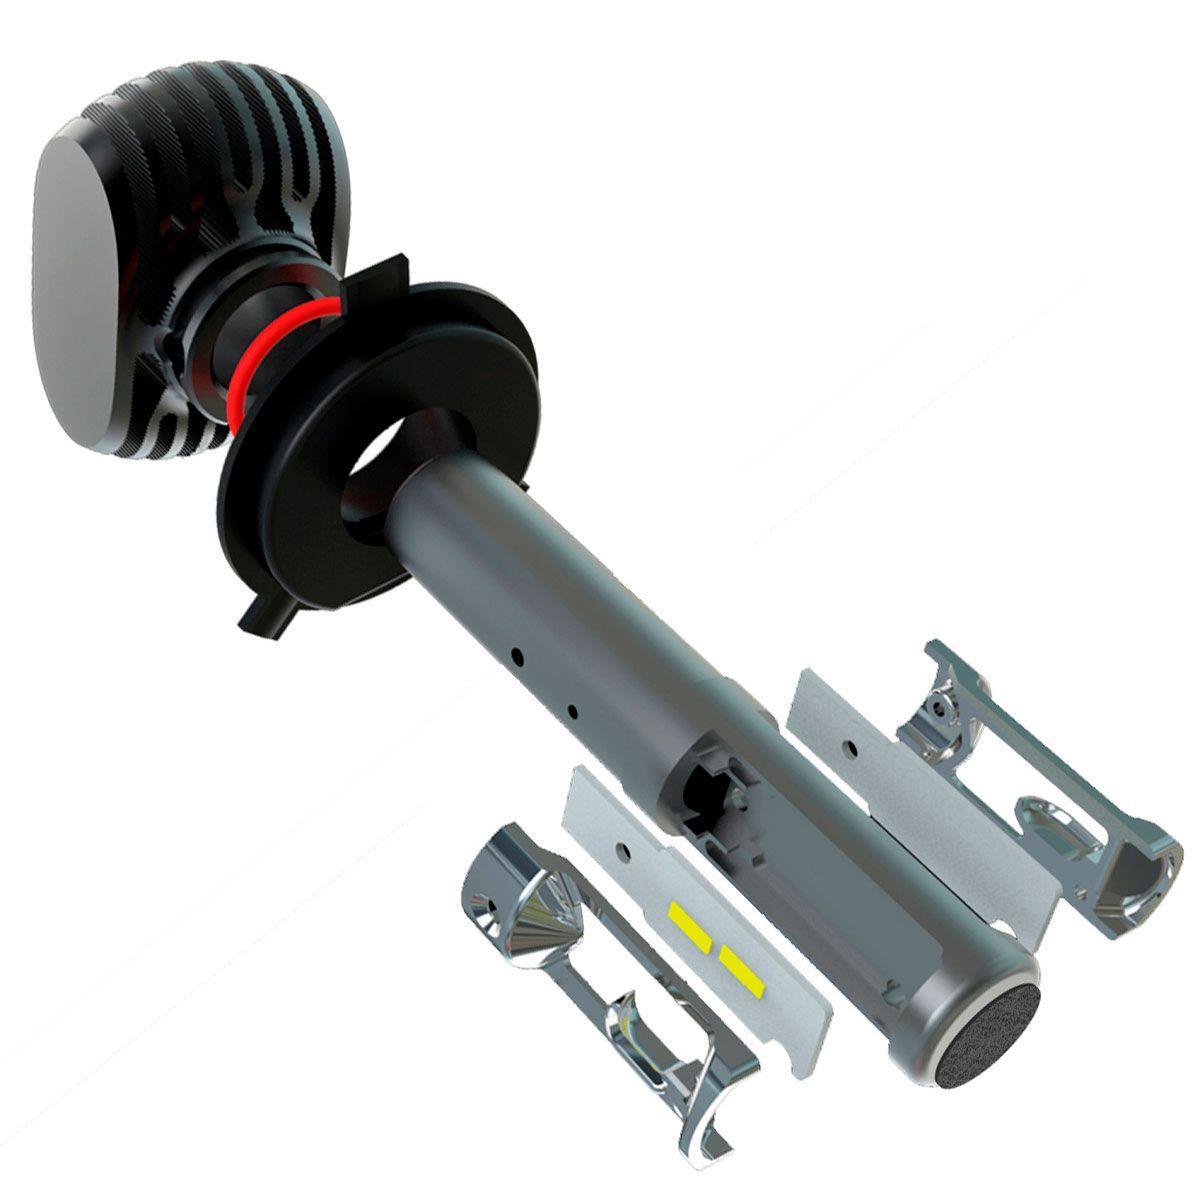 Kit Ultra LED HB20 2013 até 2020 tipo xenon farol alto e baixo H4 50W